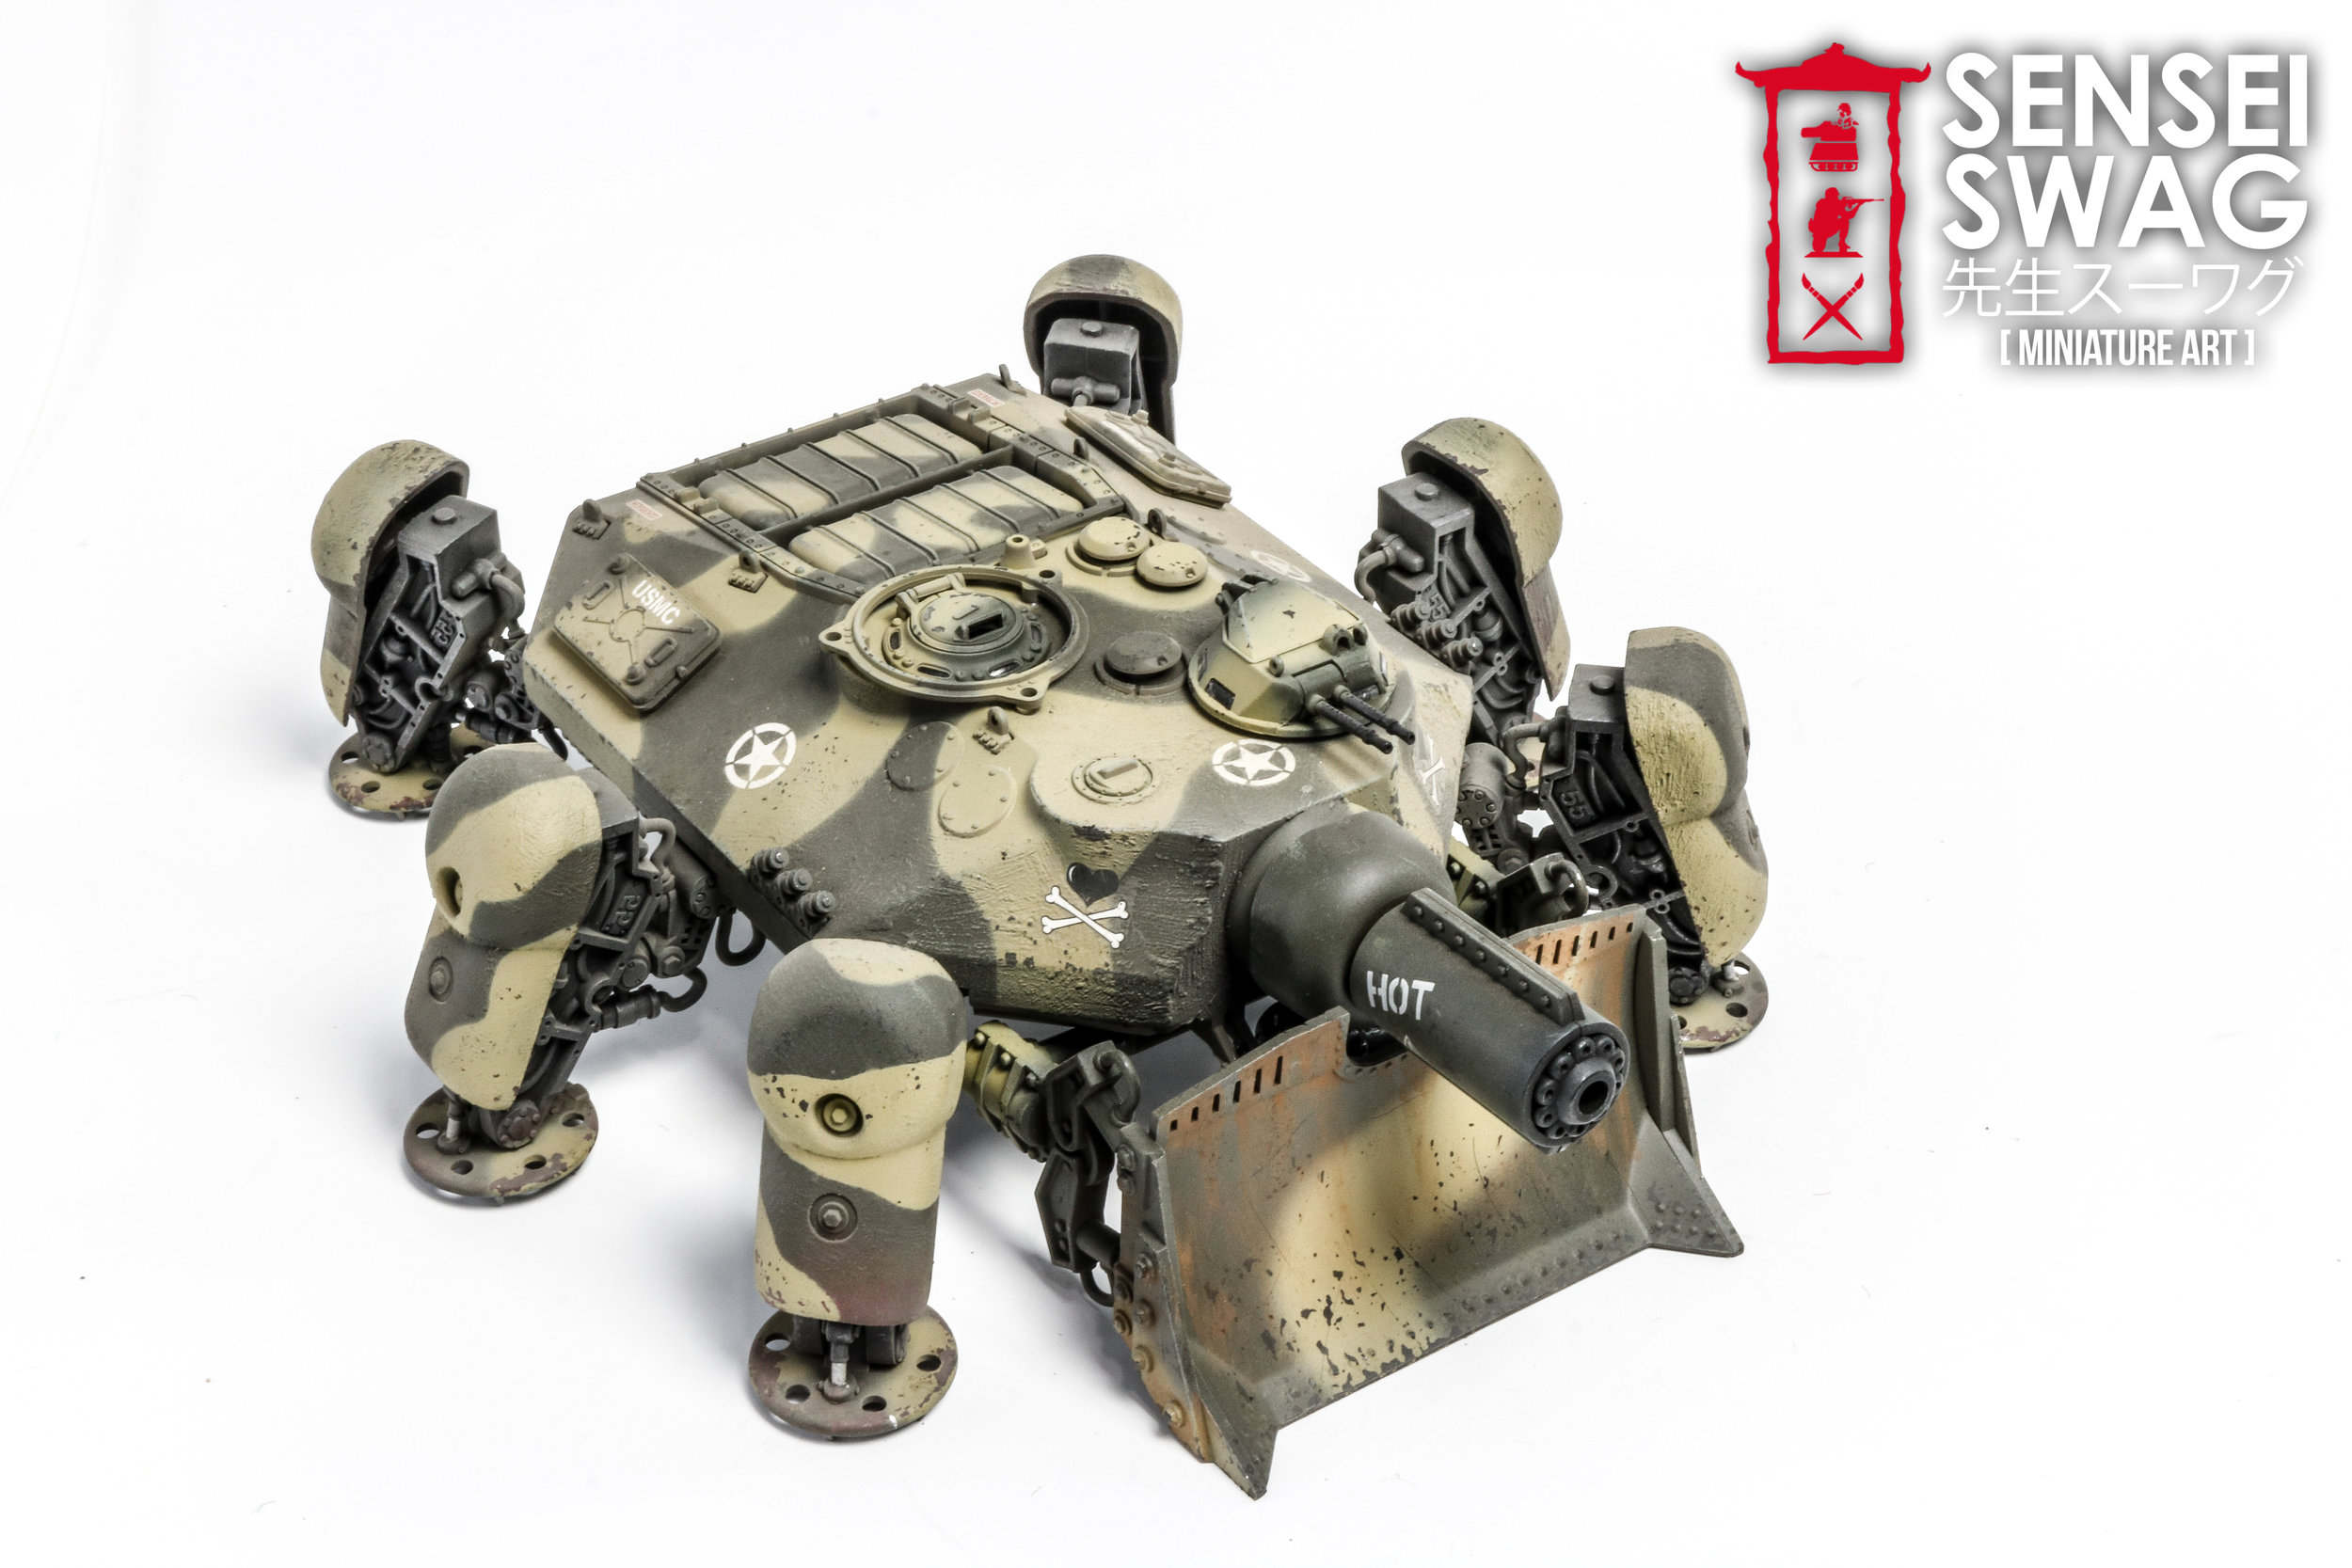 Dust Tactics Models Warfare Axis Allies Army-14.jpg